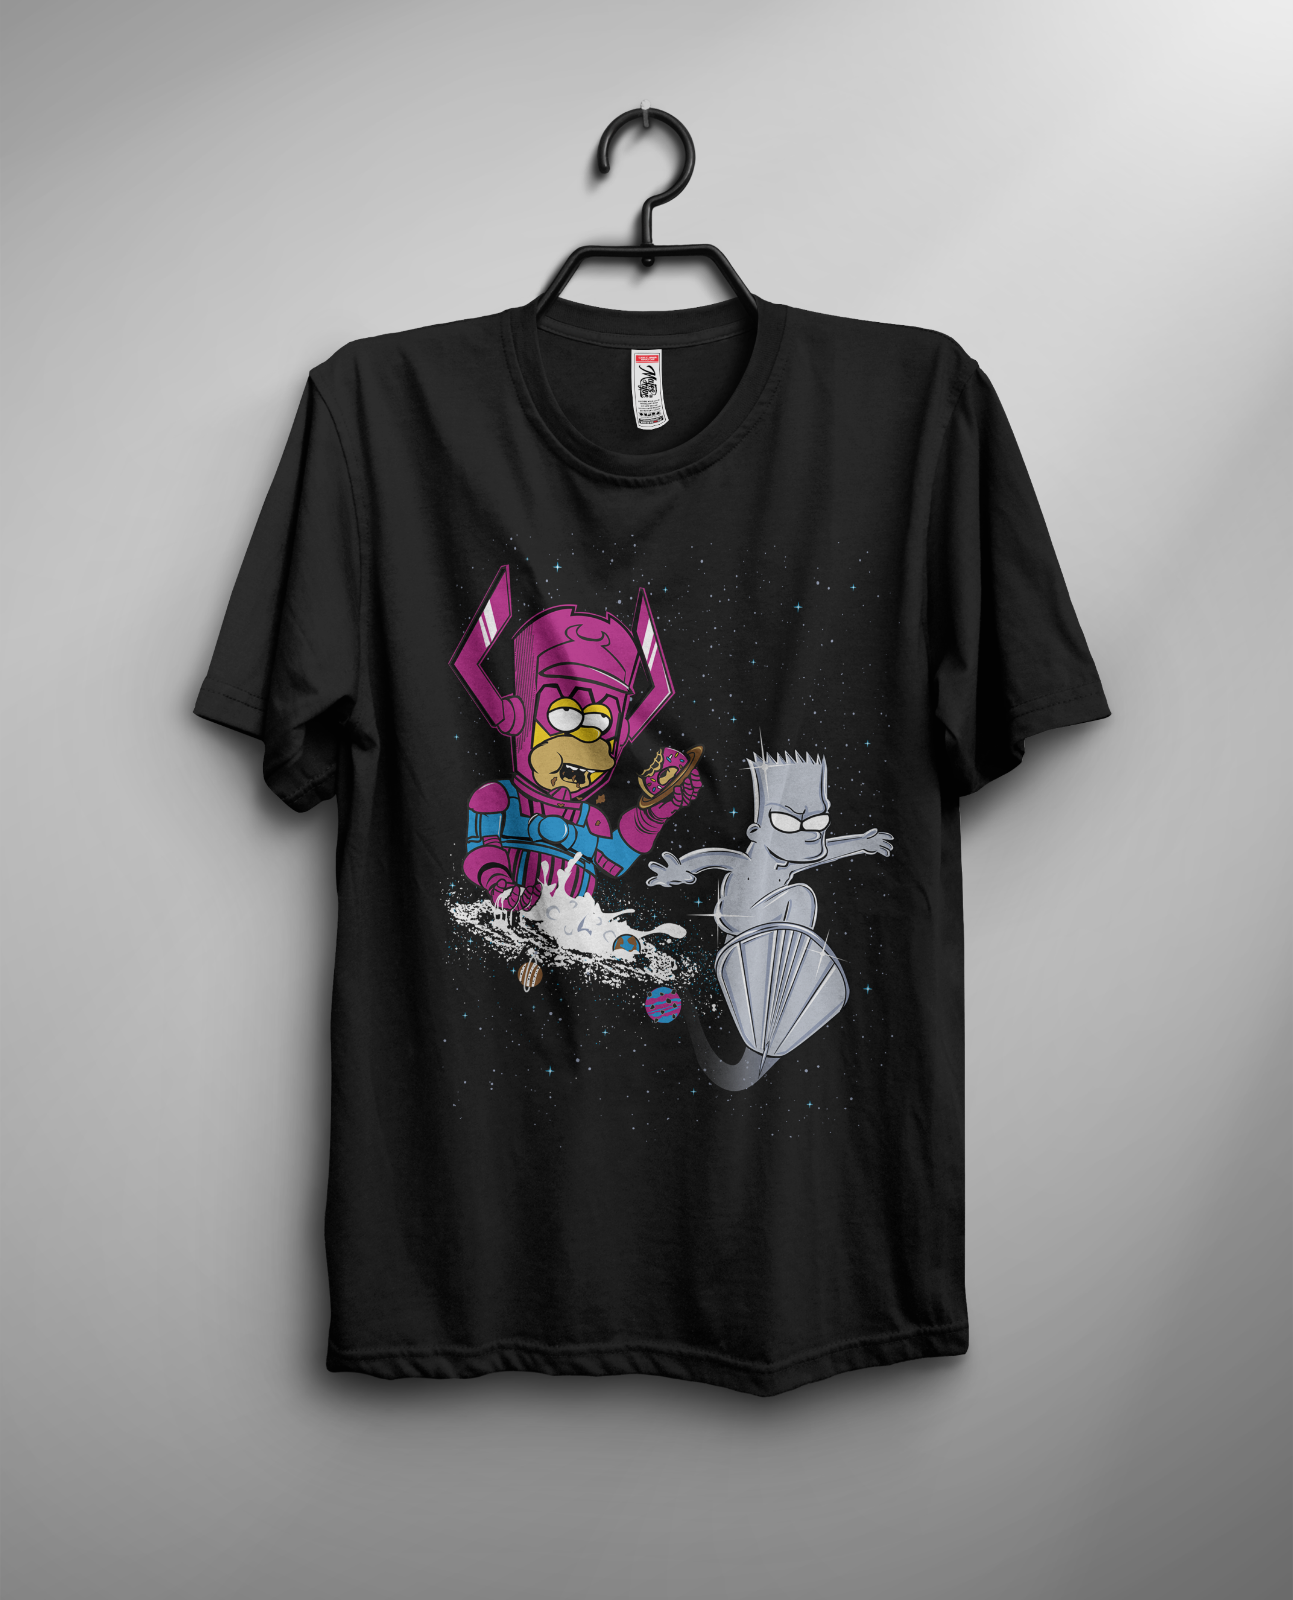 The Rad Surfer T-shirt Simpson Silver Surfer Galactus Bart Homer Comics FUnny Men Cotton T-Shirt Printed T Shirt Top Tee